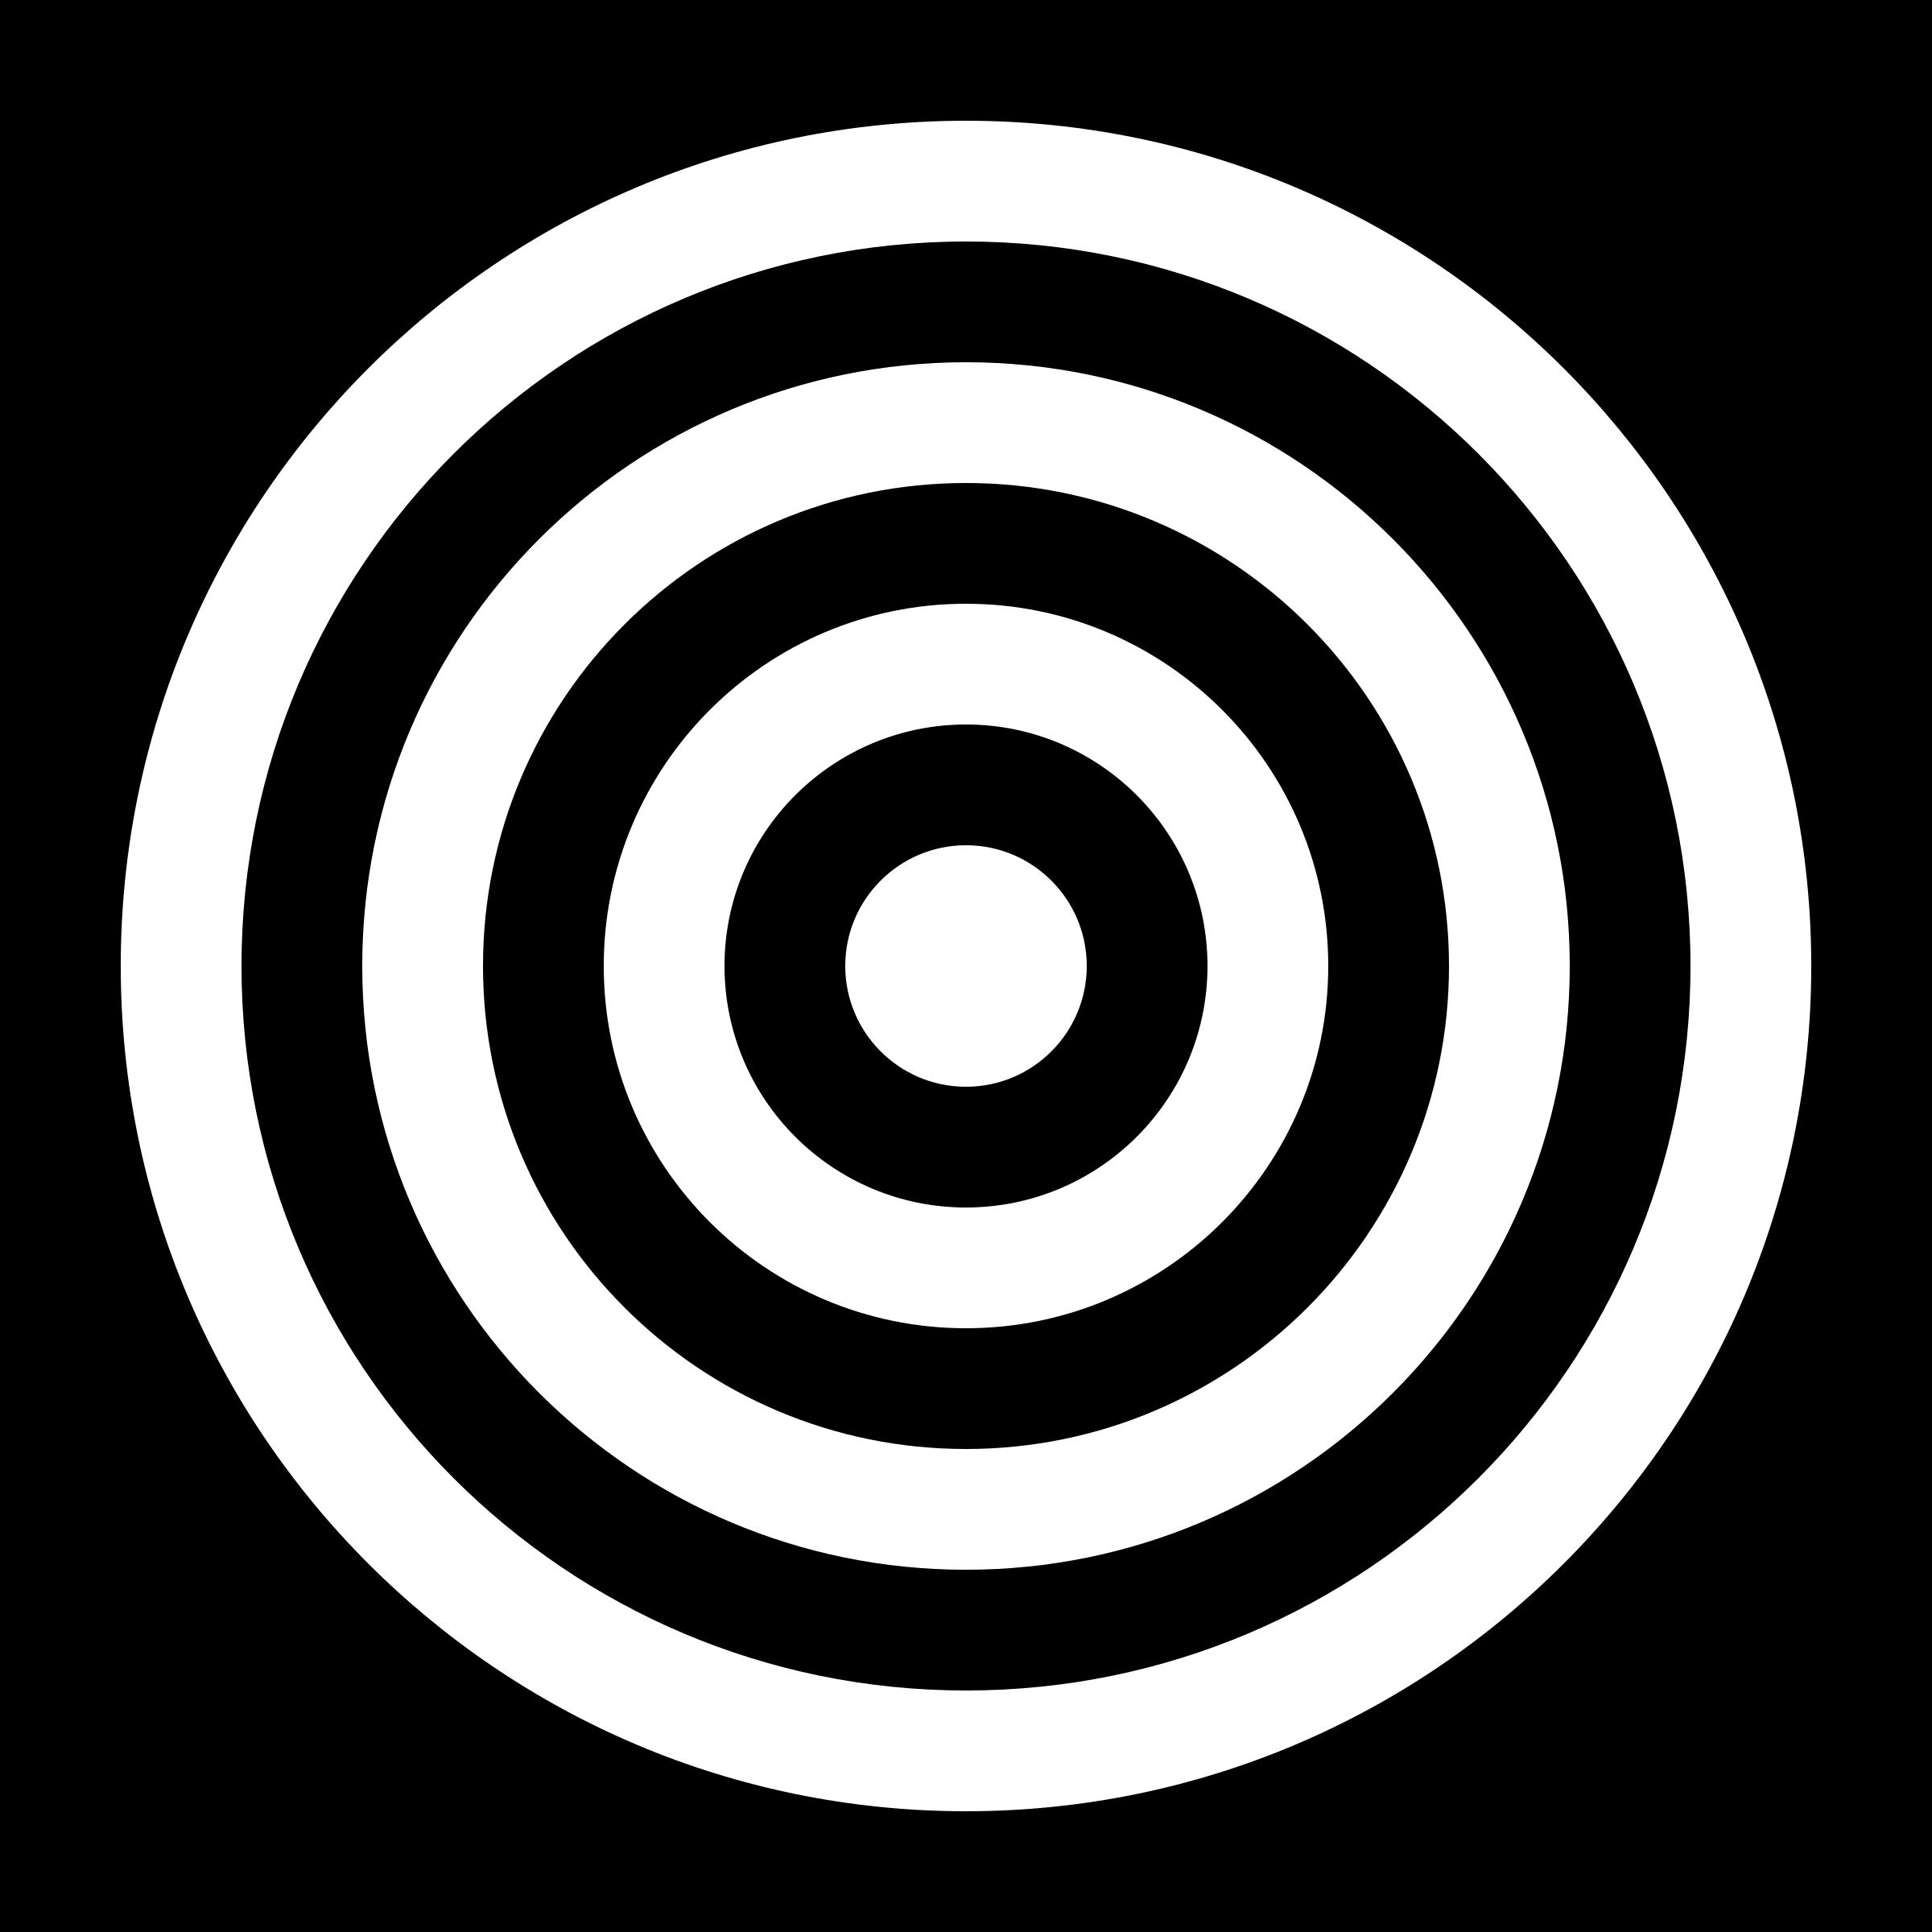 Target clipart clip freeuse Target Clip Art Bullseye   Clipart Panda - Free Clipart Images clip freeuse